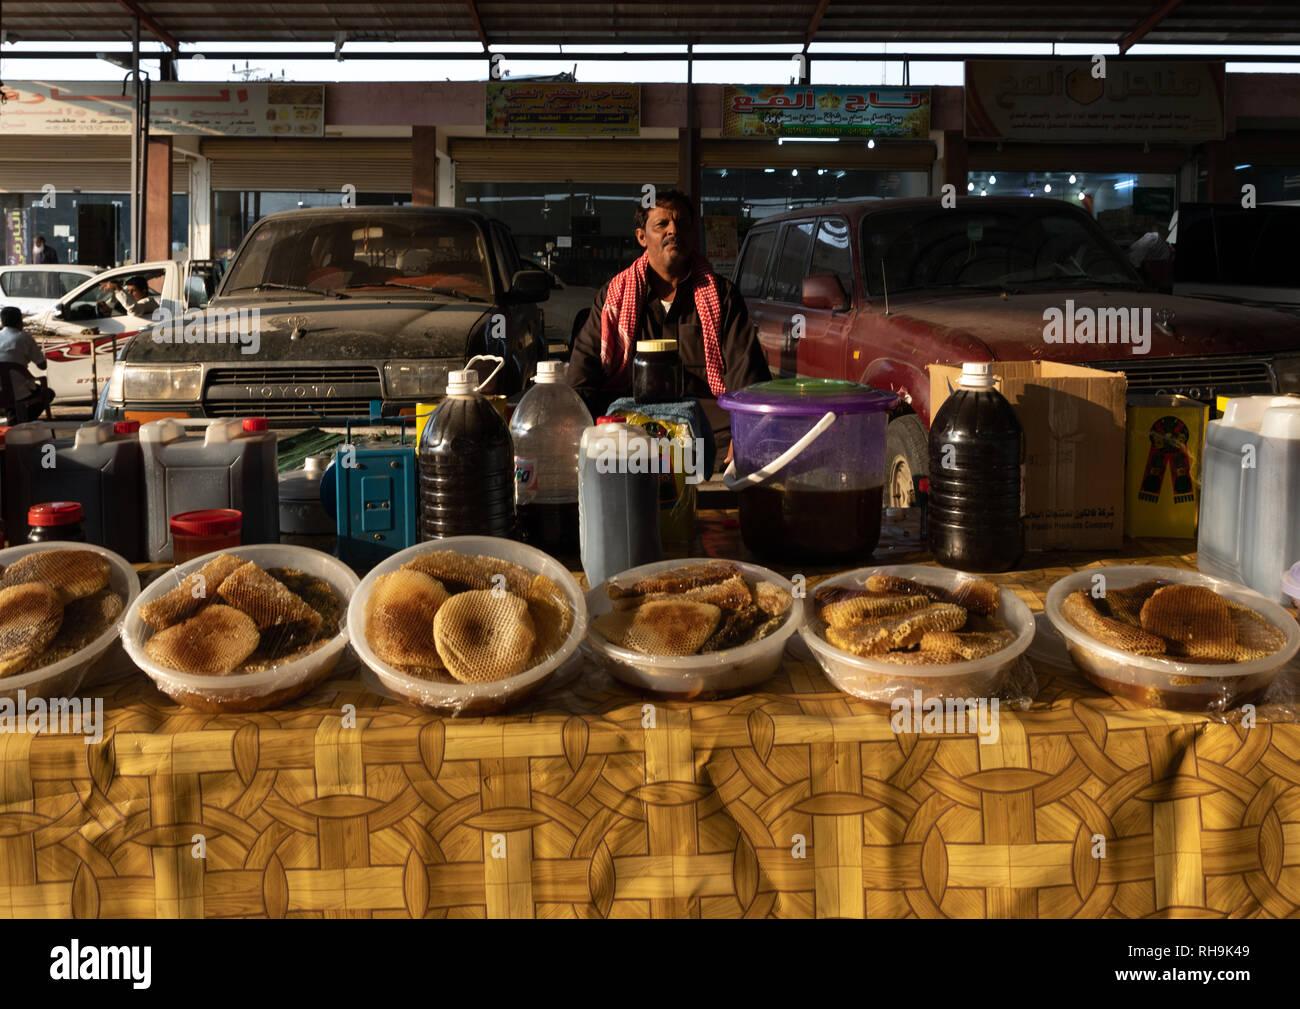 Saudi man selling honey and honeycombs on a market, Asir